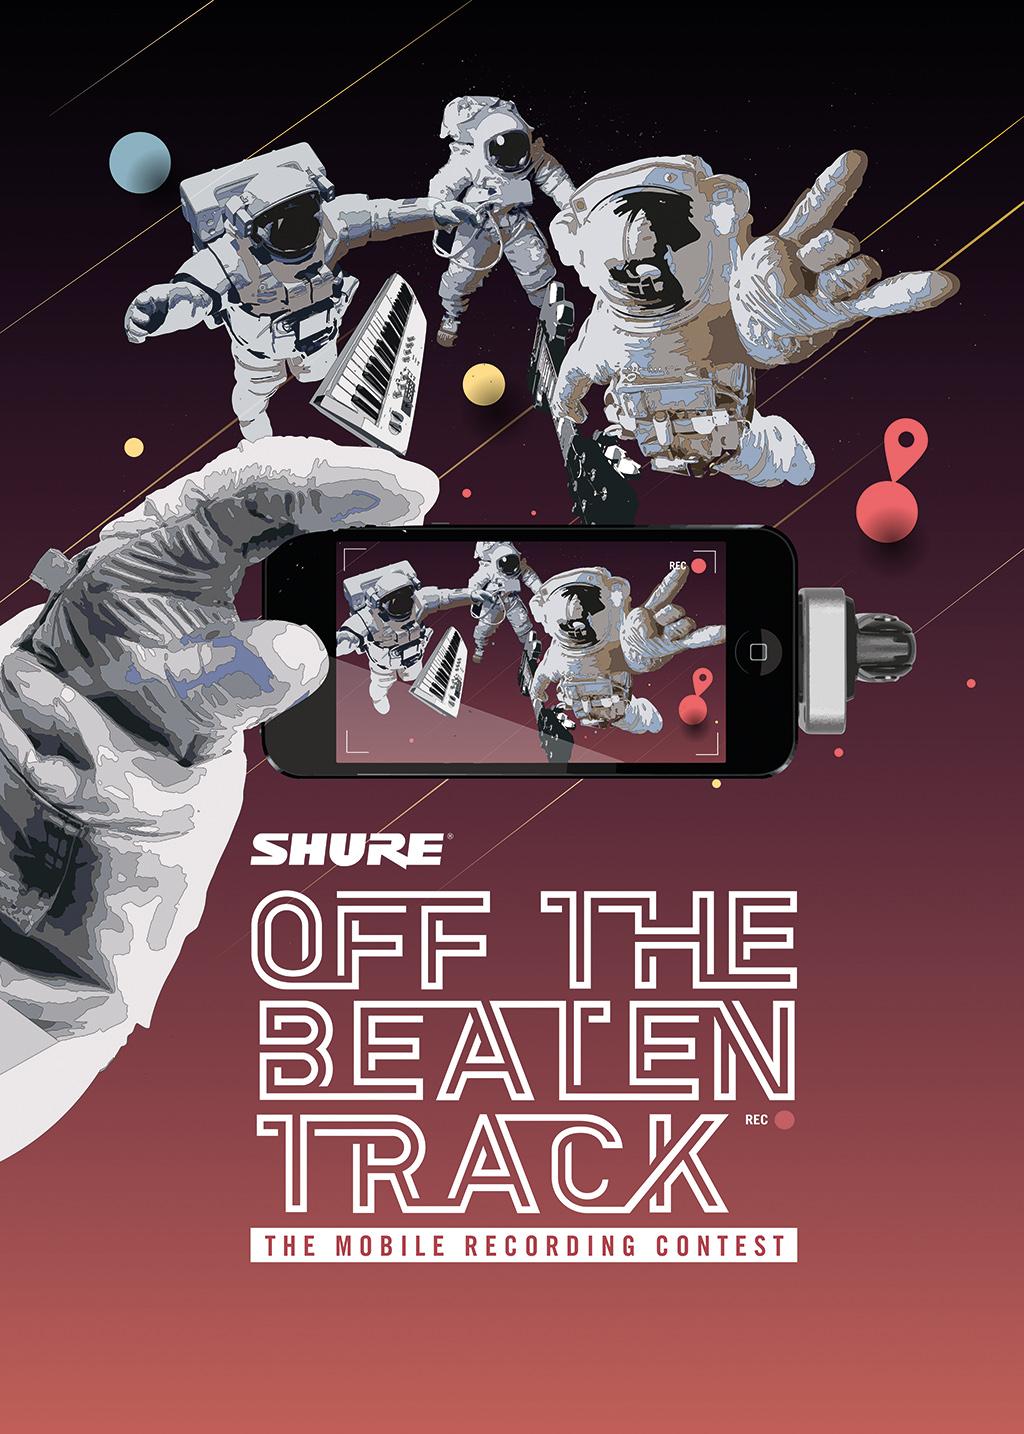 "Shure ruft zum Mobile Recording Contest ""Off the Beaten Track"" auf"